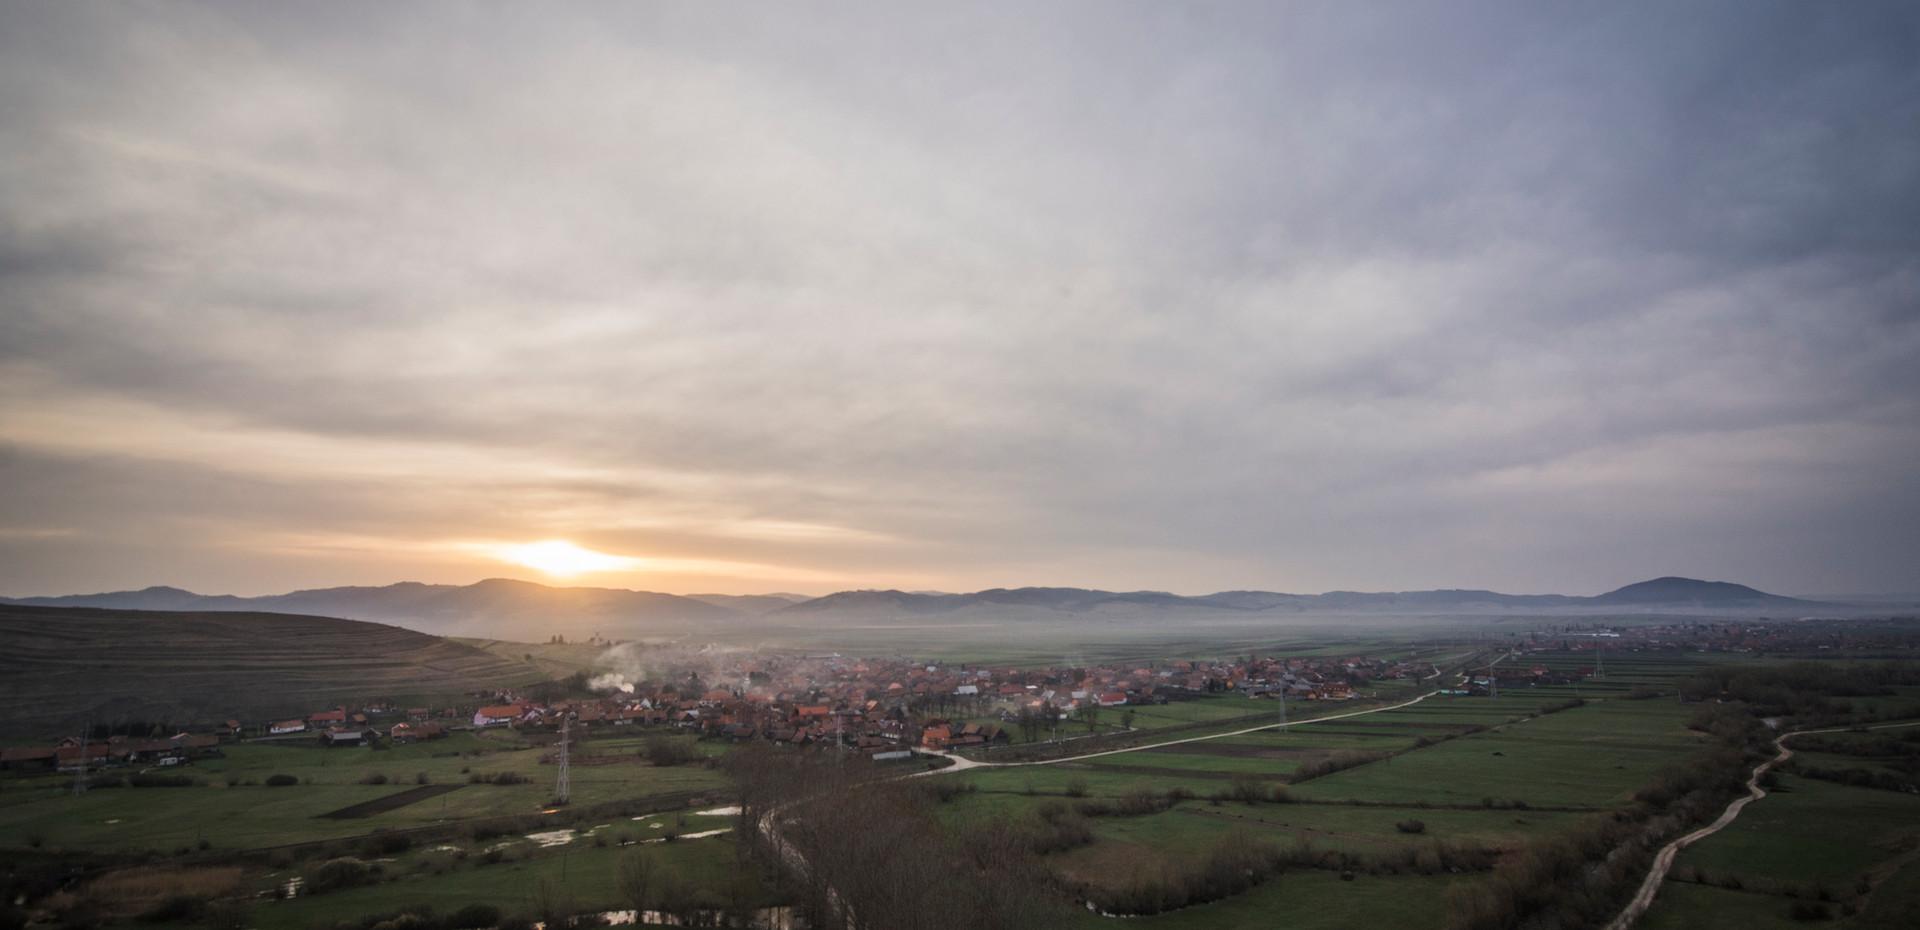 Csíkrákos / Racu Harghita county / Hargita megye / Județul Harghita Romania / Románia / România 2017